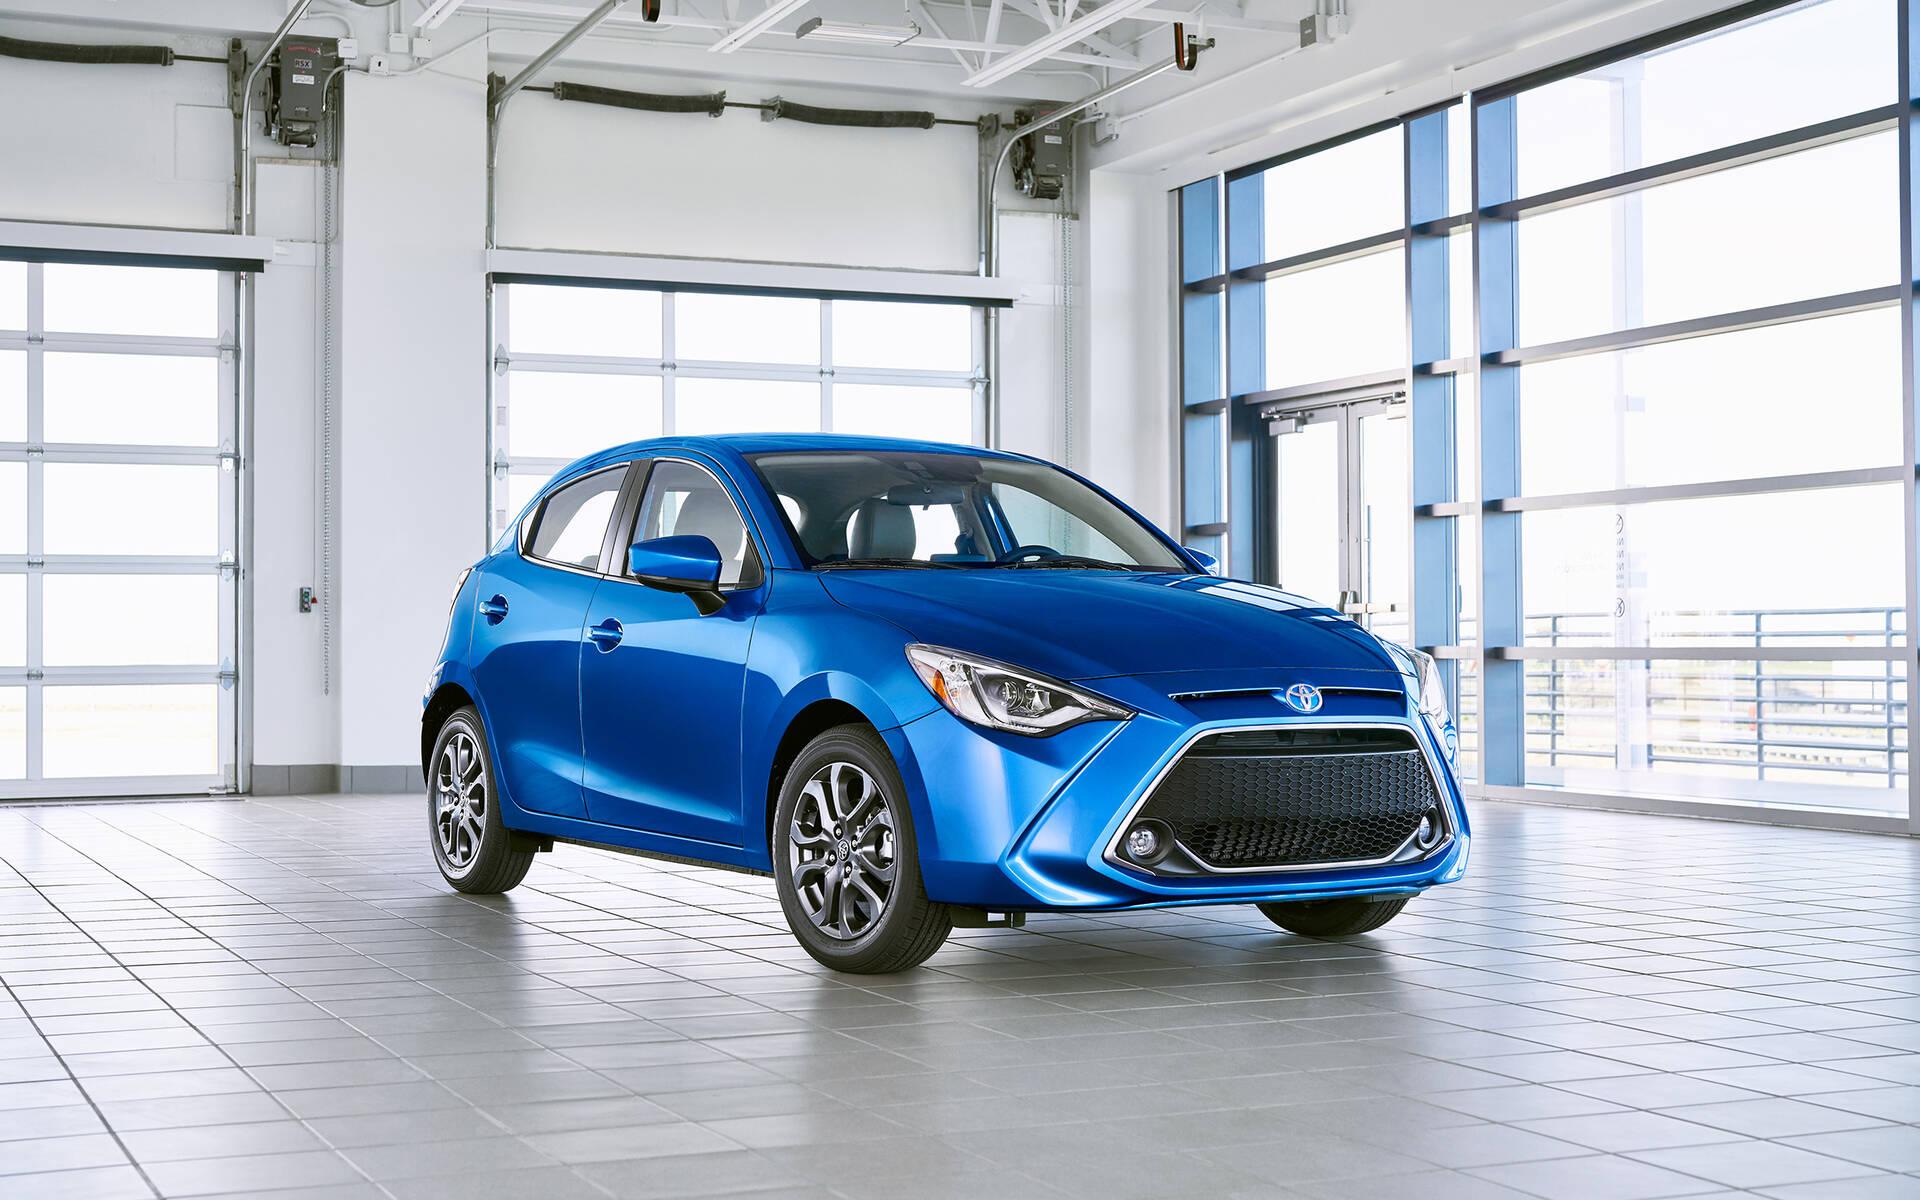 Kekurangan Toyota Yaris Spesifikasi